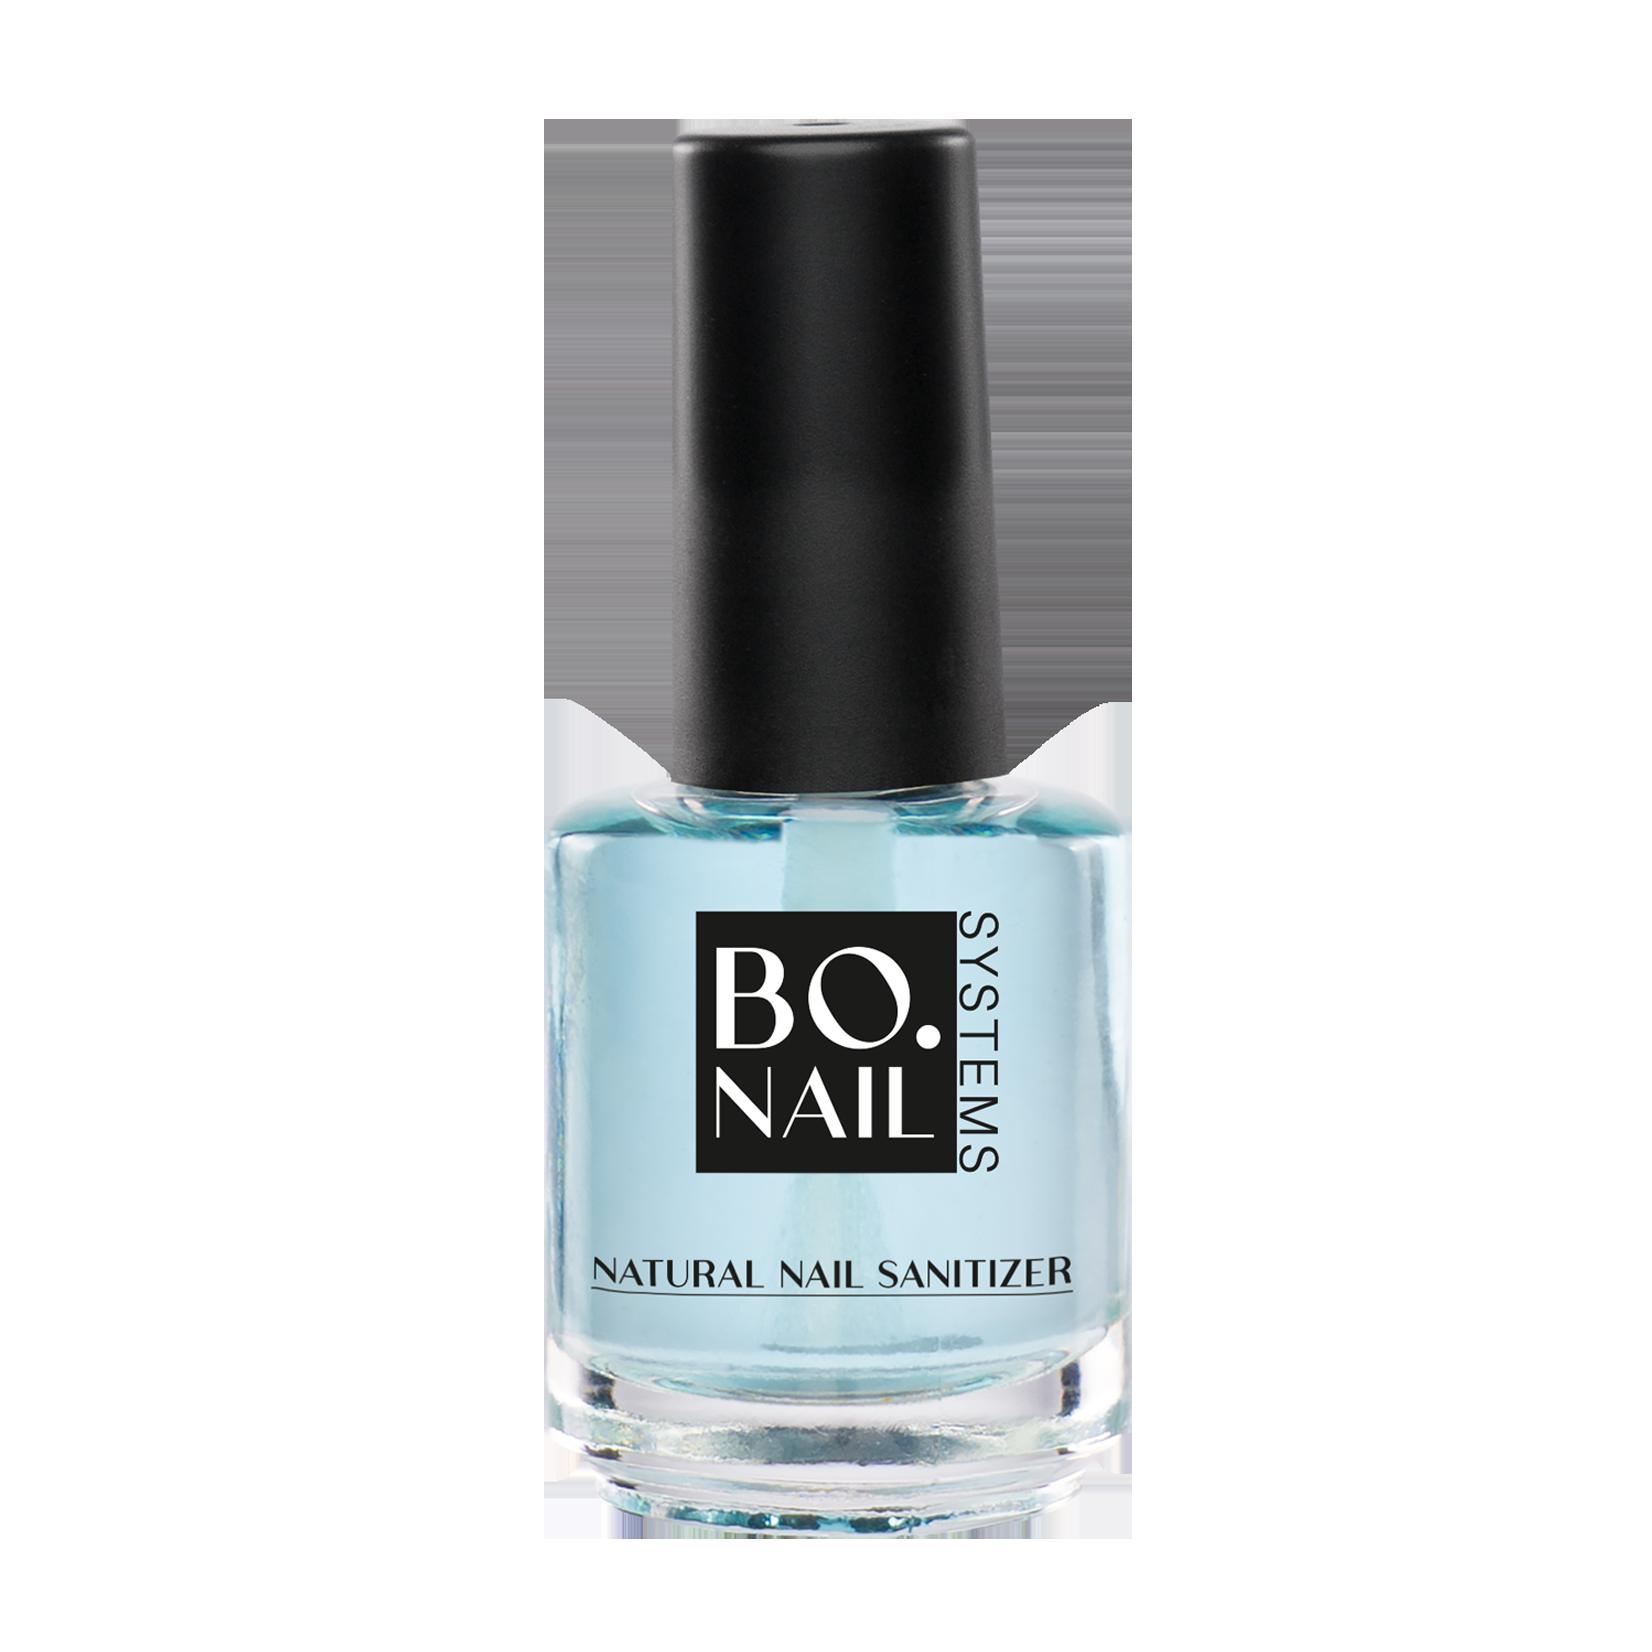 BO.-Natural-Nail-Sanitizer-15ml